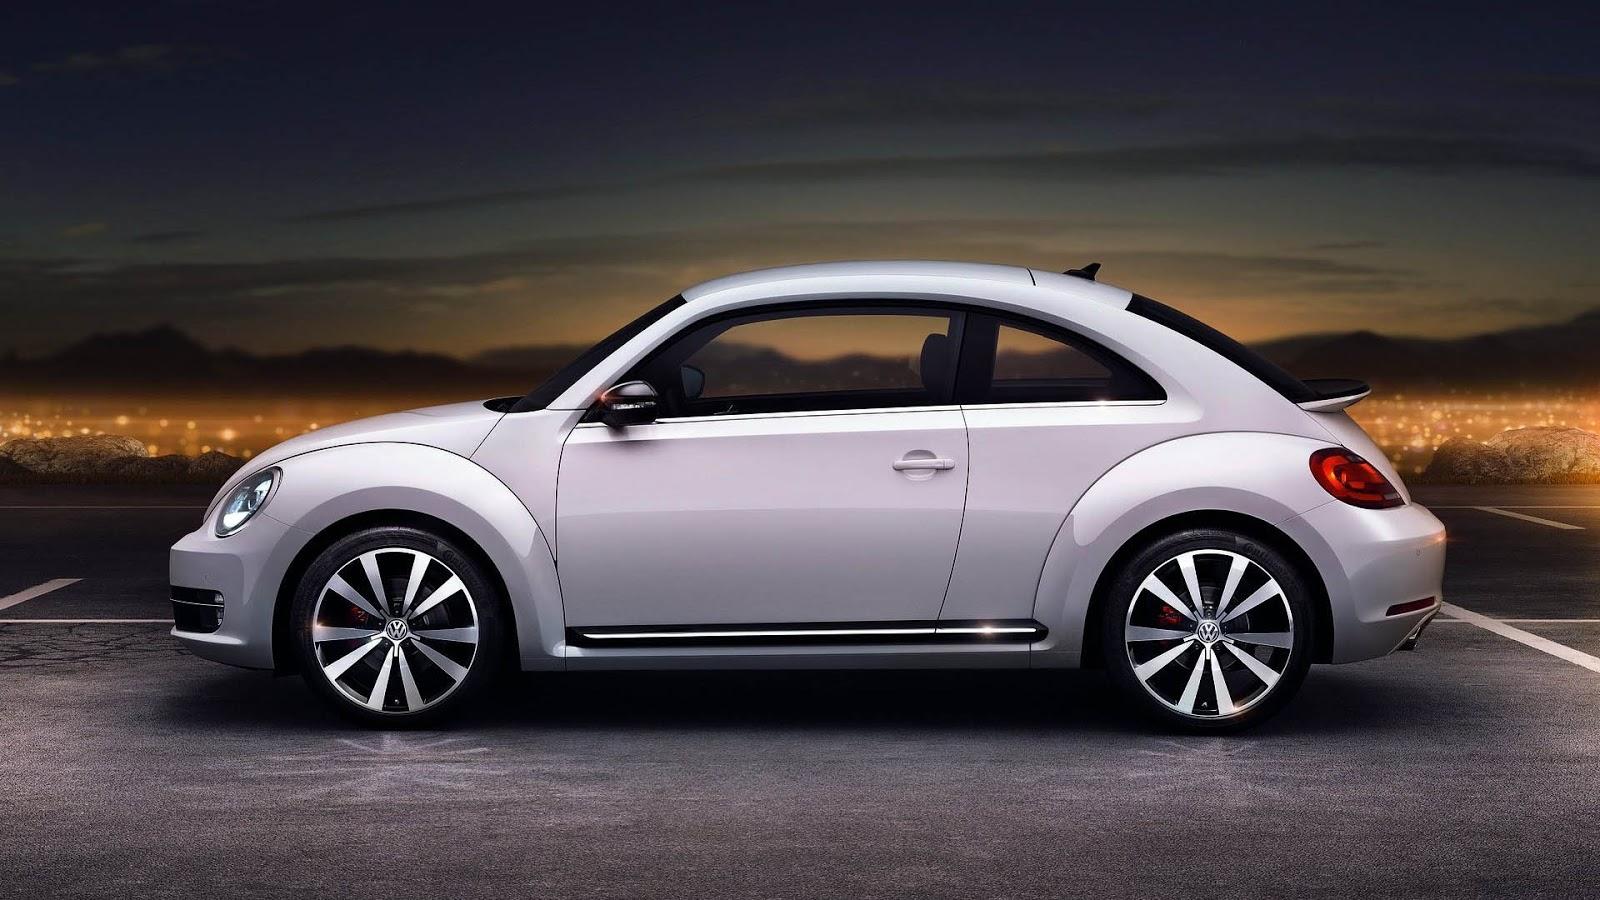 Punch Buggy Car >> Cars Cool Week: volkswagen new beetle 2012